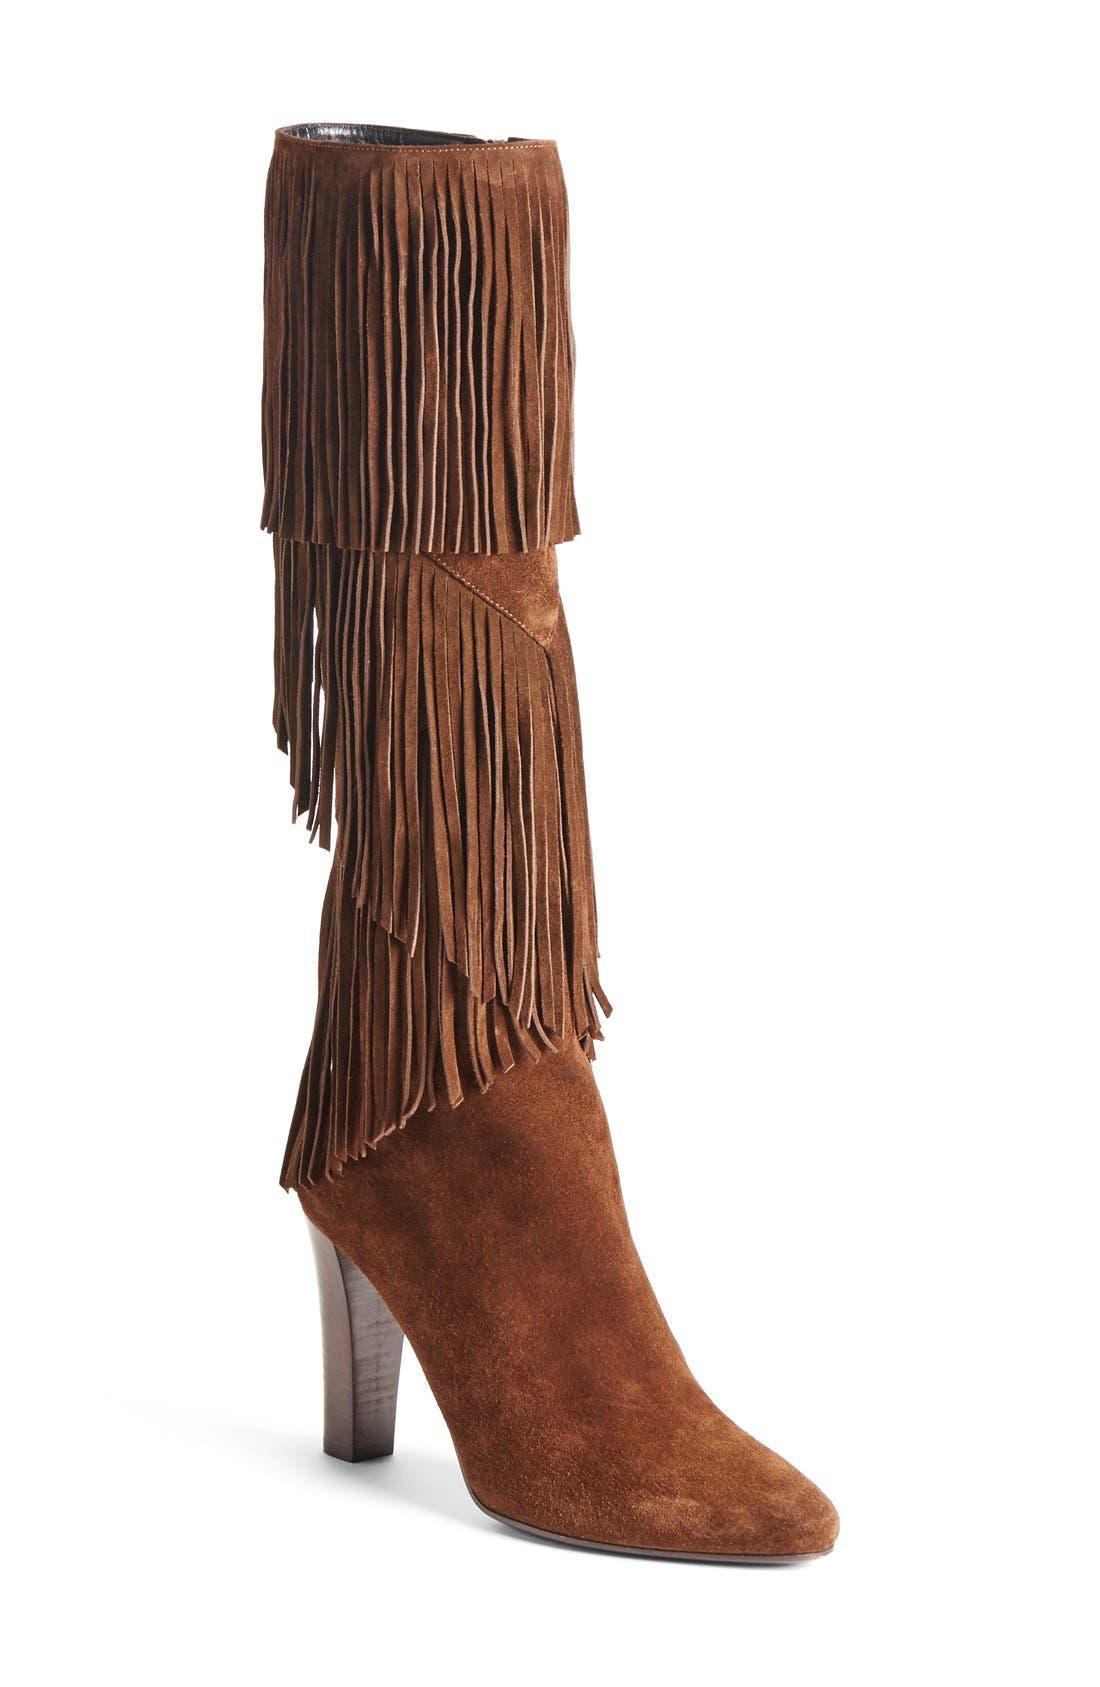 Main Image - Saint Laurent 'Lily' Fringe Tall Boot (Women)